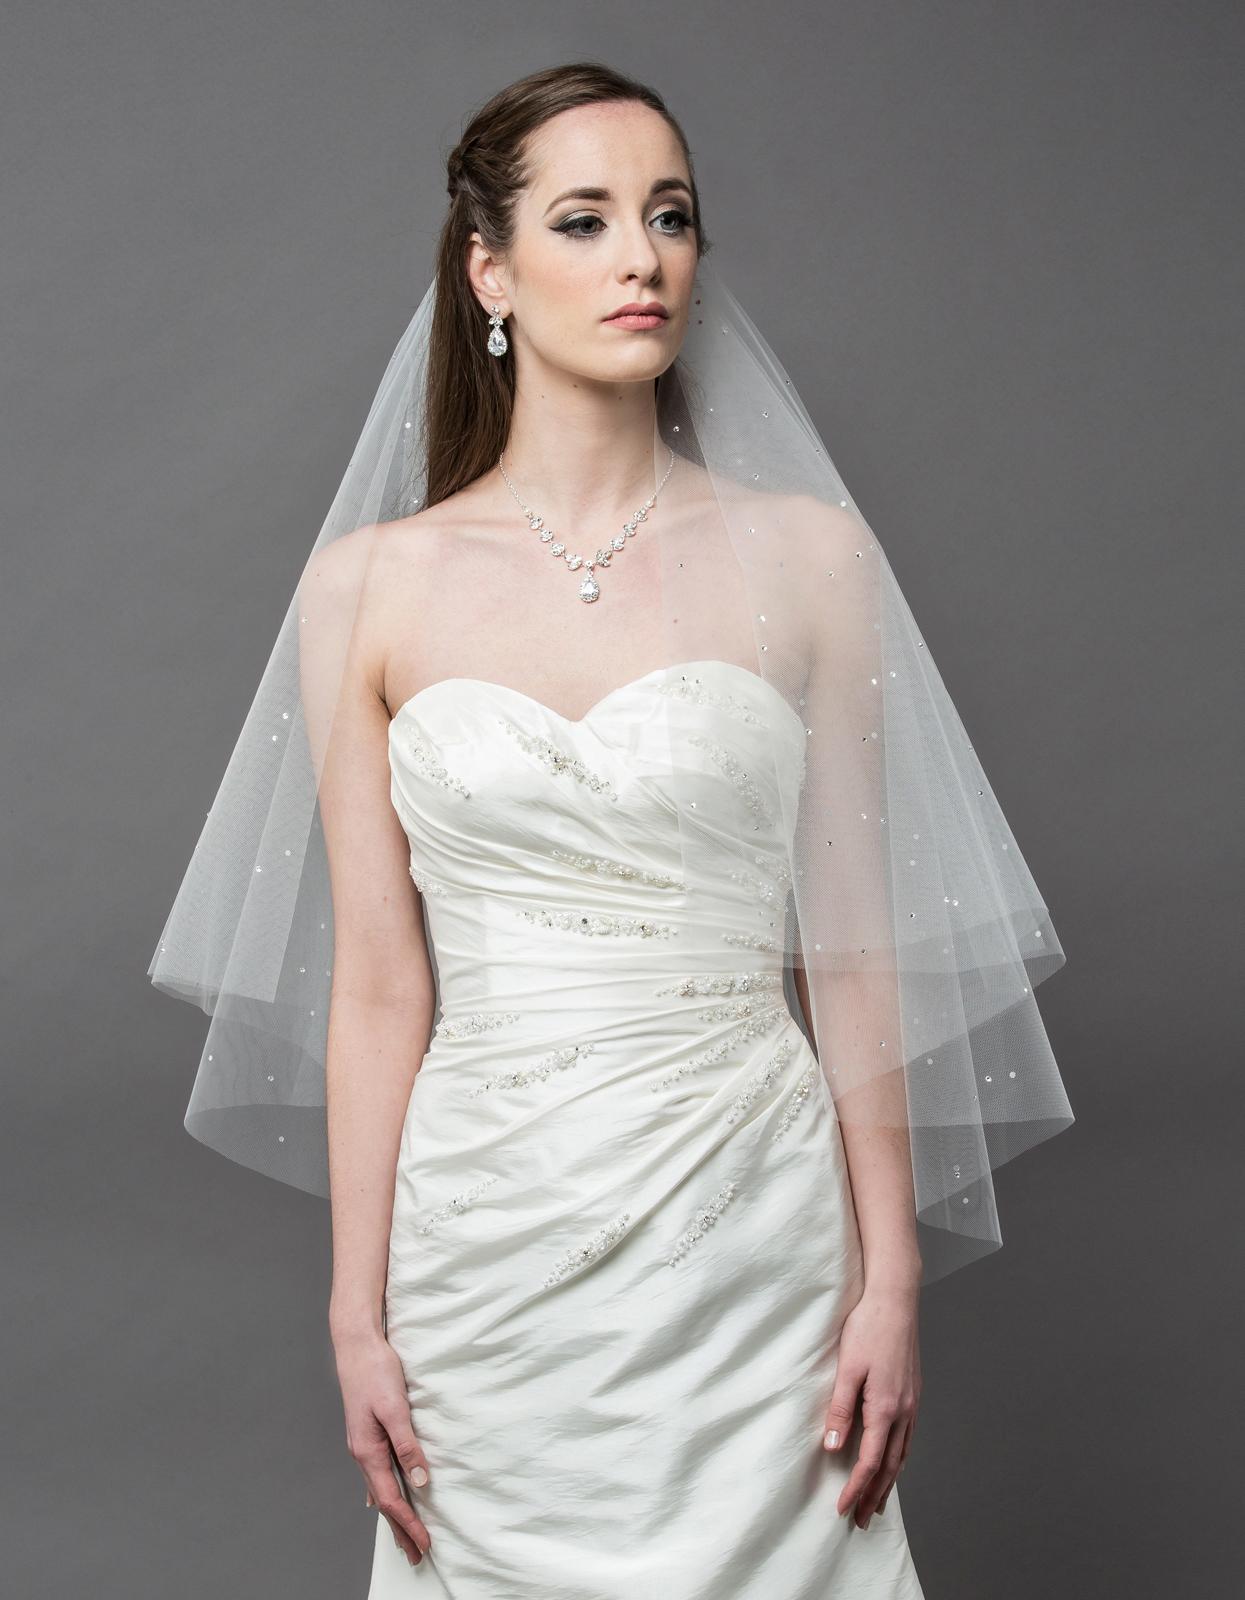 Bridal Classics Marquise Veil Collection MV-2373